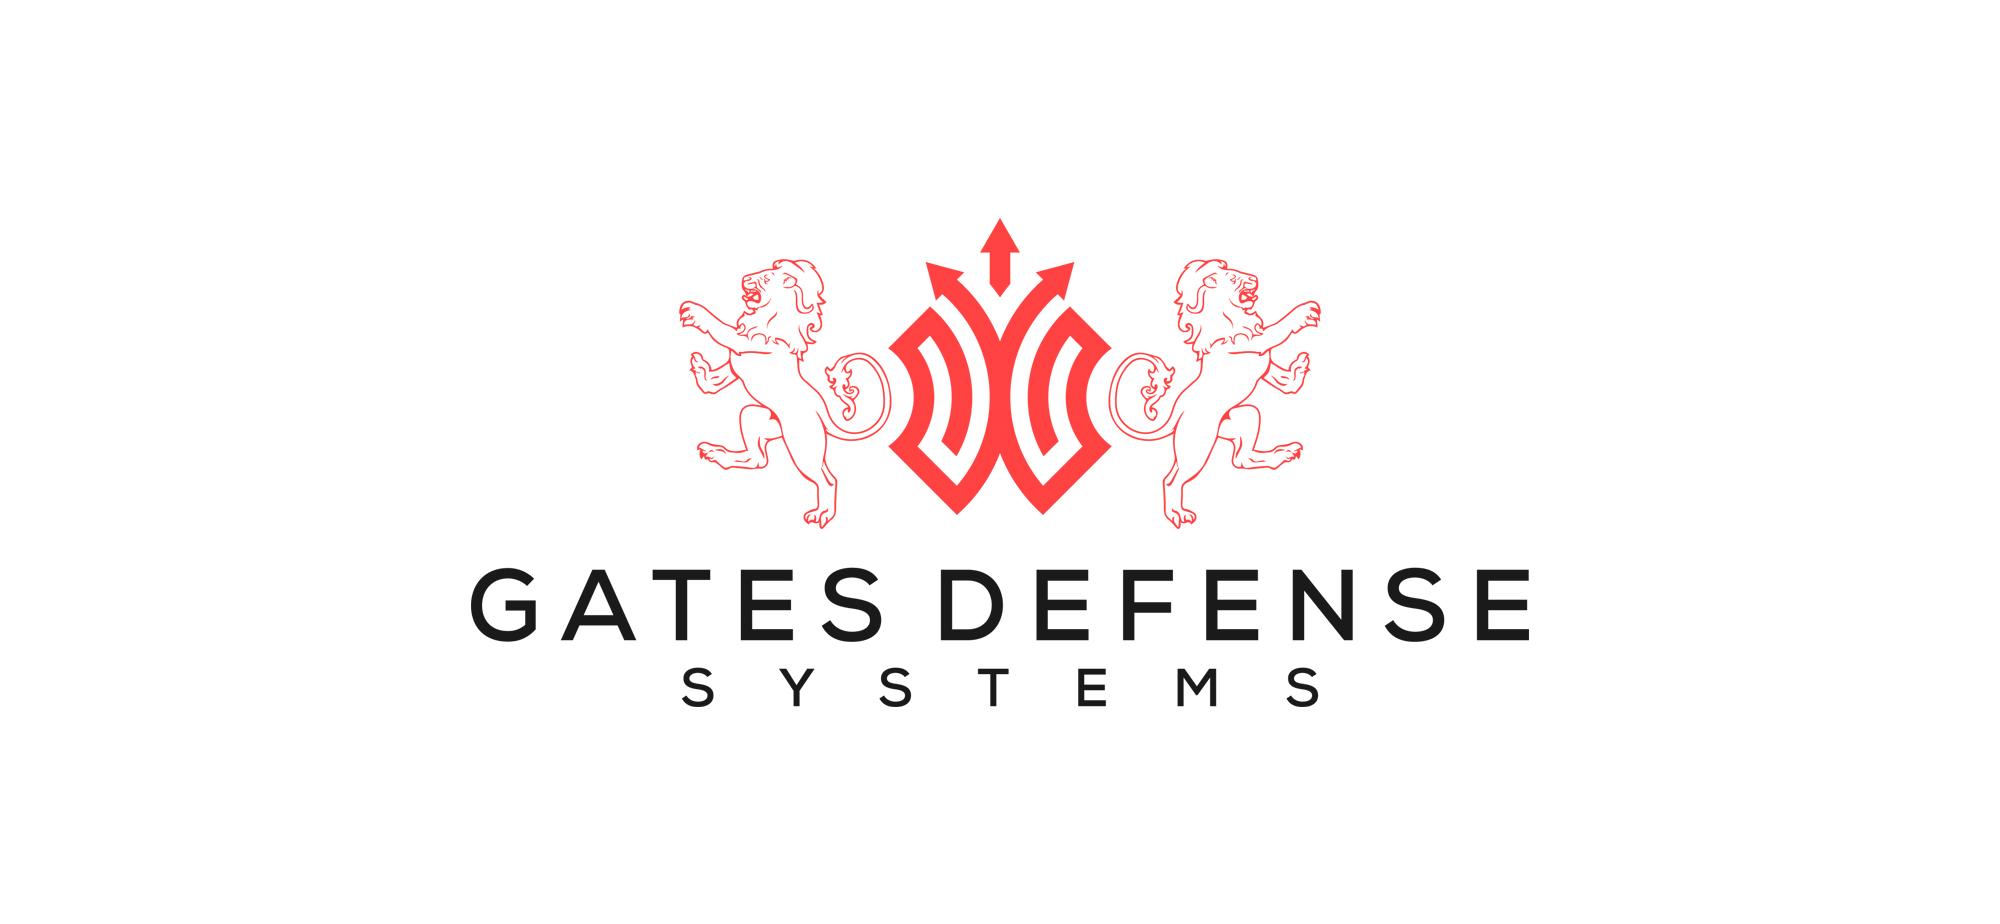 Gates Desfense jpg.jpg